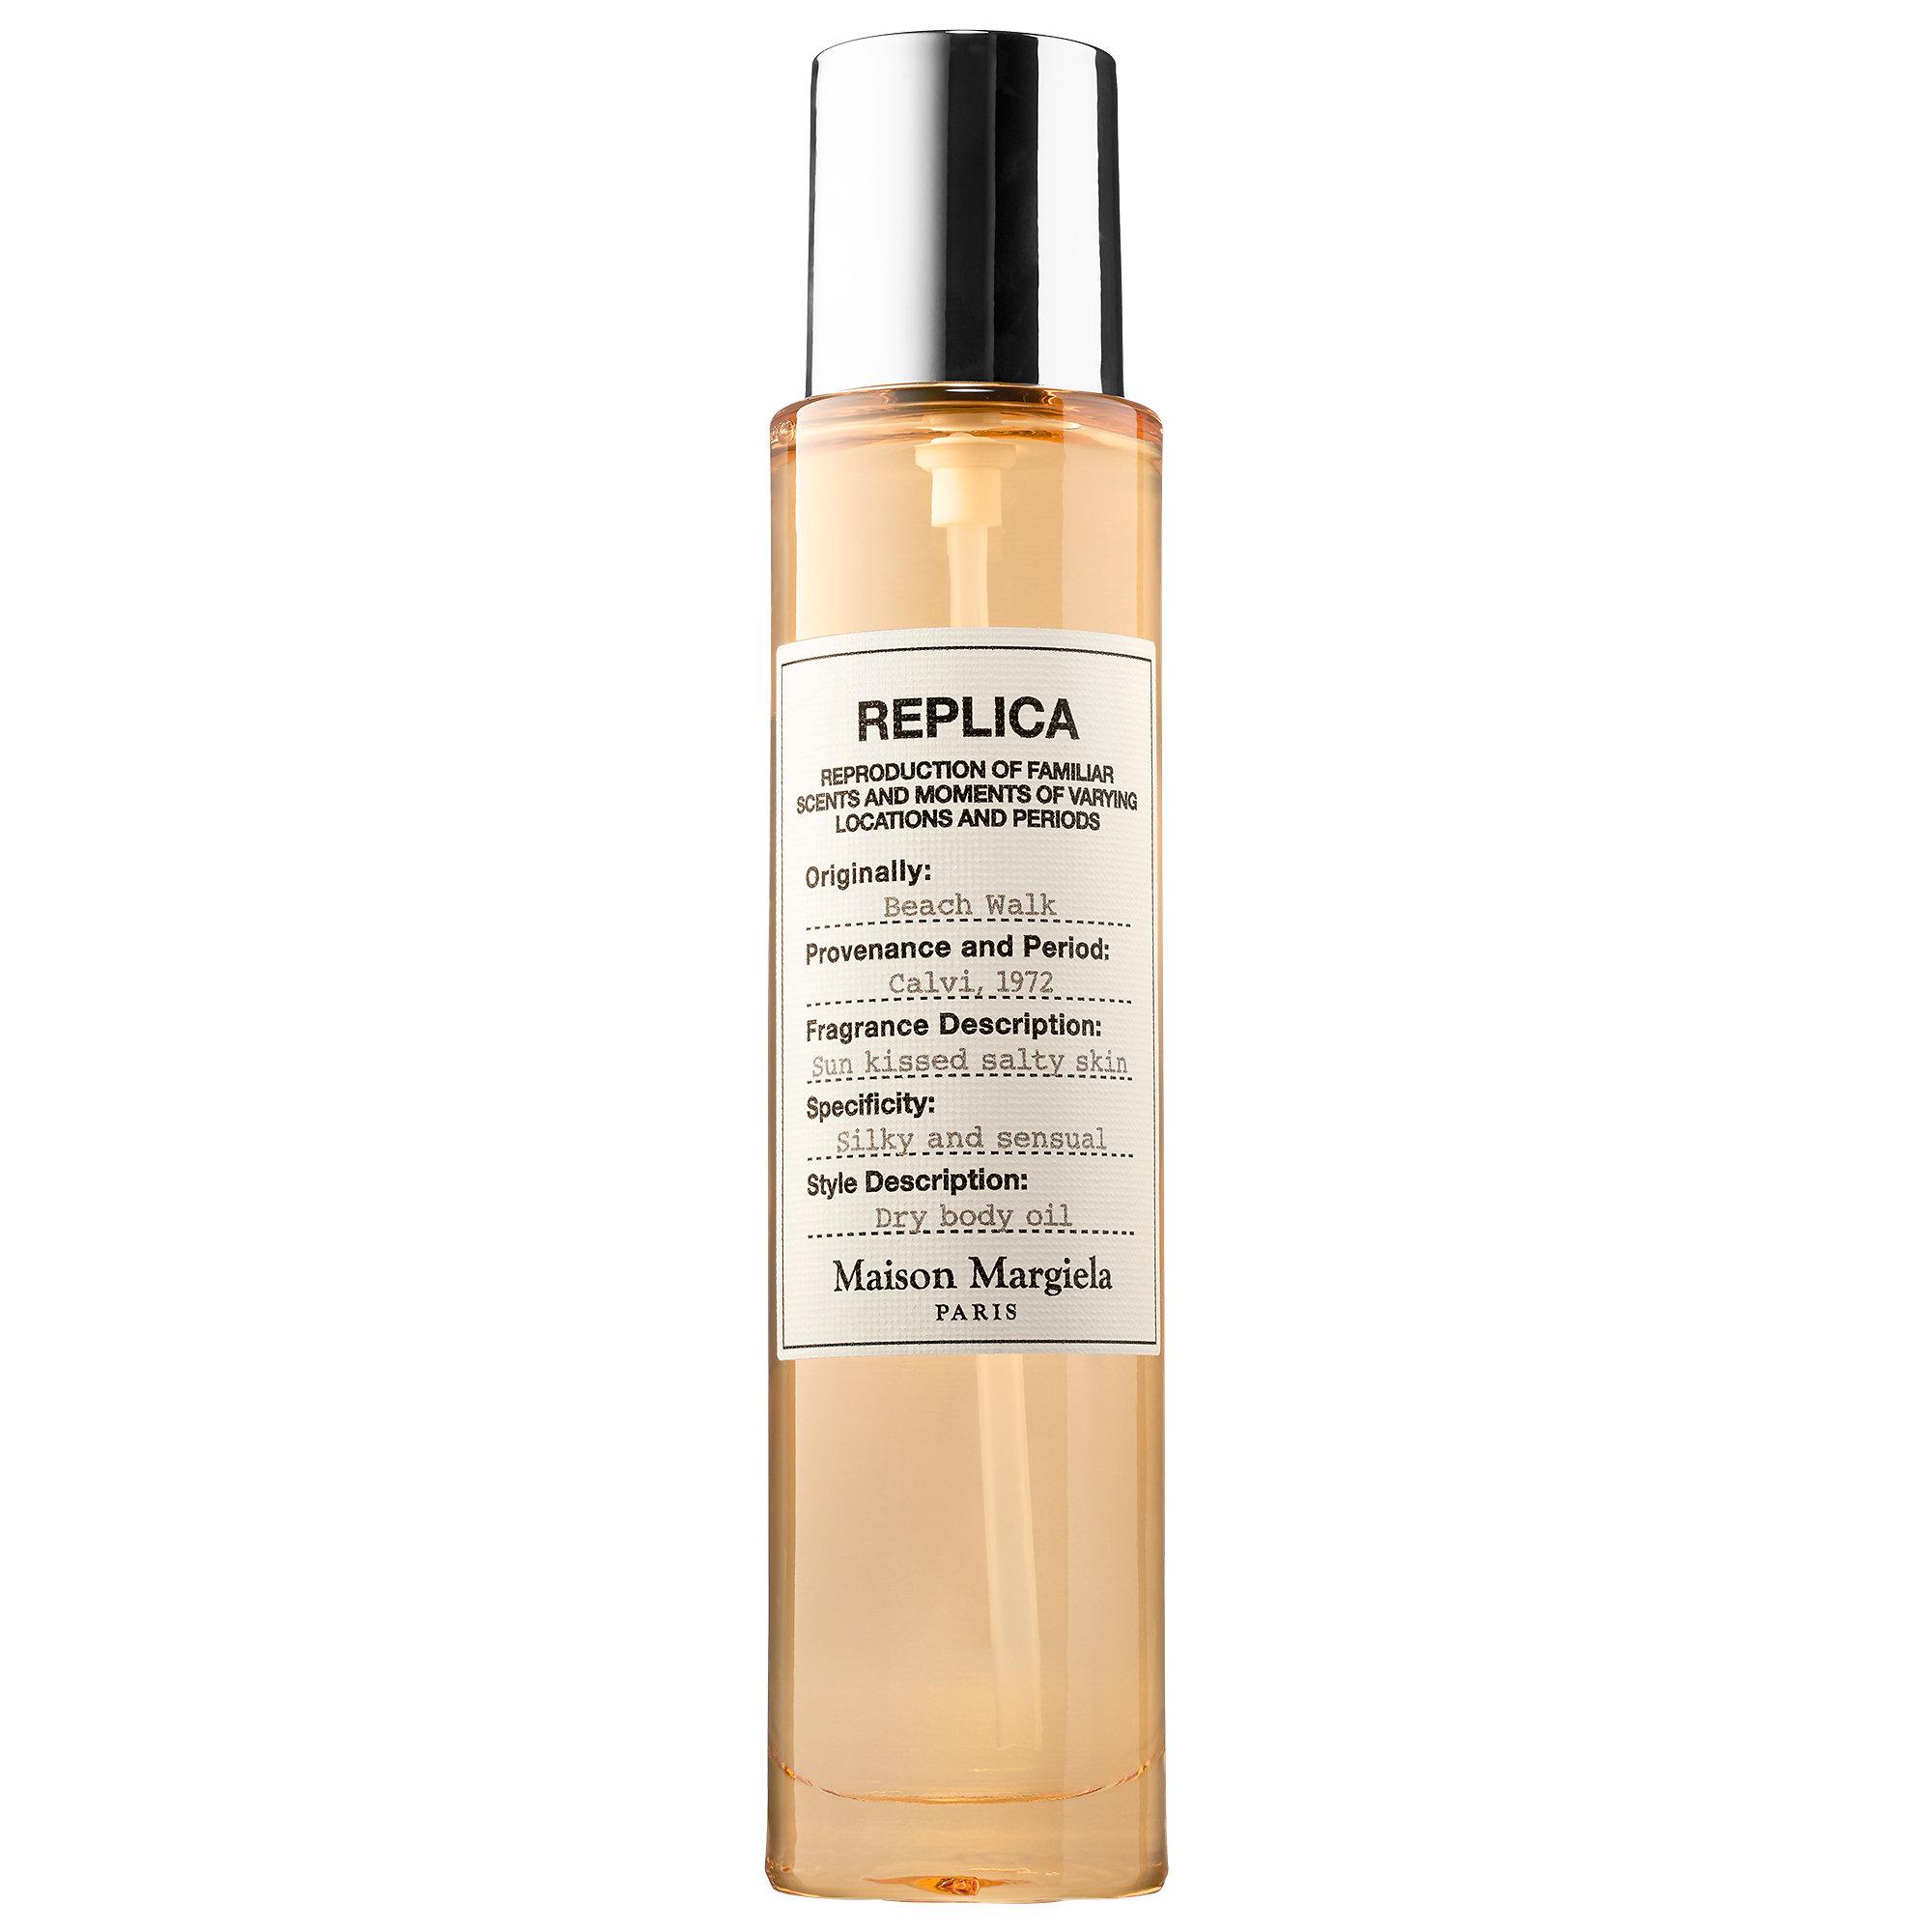 MAISON MARGIELA   'REPLICA' Beach Walk Dry Body Oil;   $60